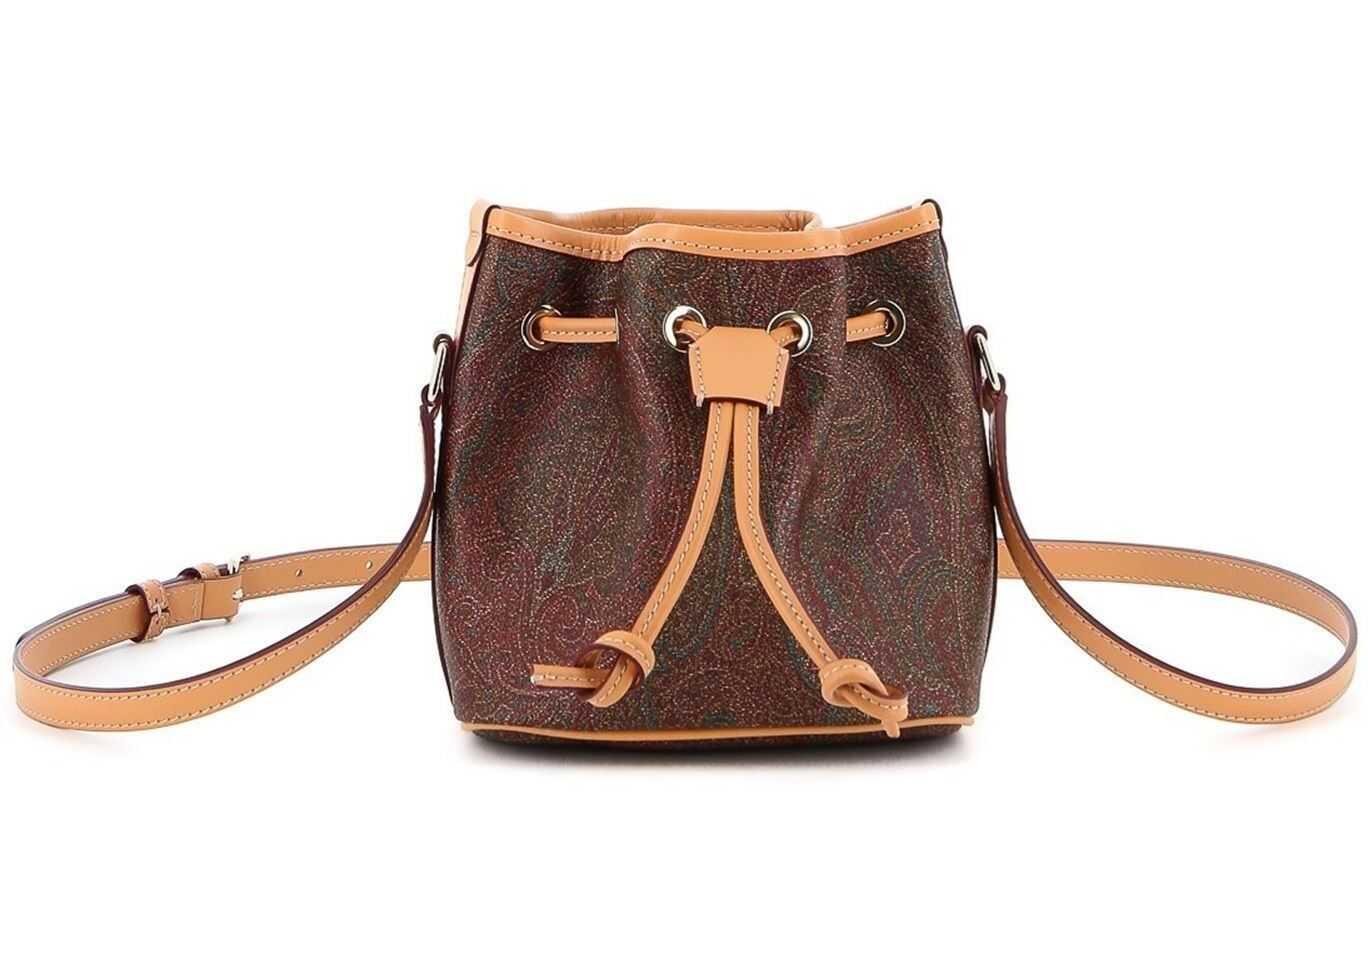 ETRO Book Paisley Classic Mini Bucket Bag In Brown 0H154 8010 600 Brown imagine b-mall.ro